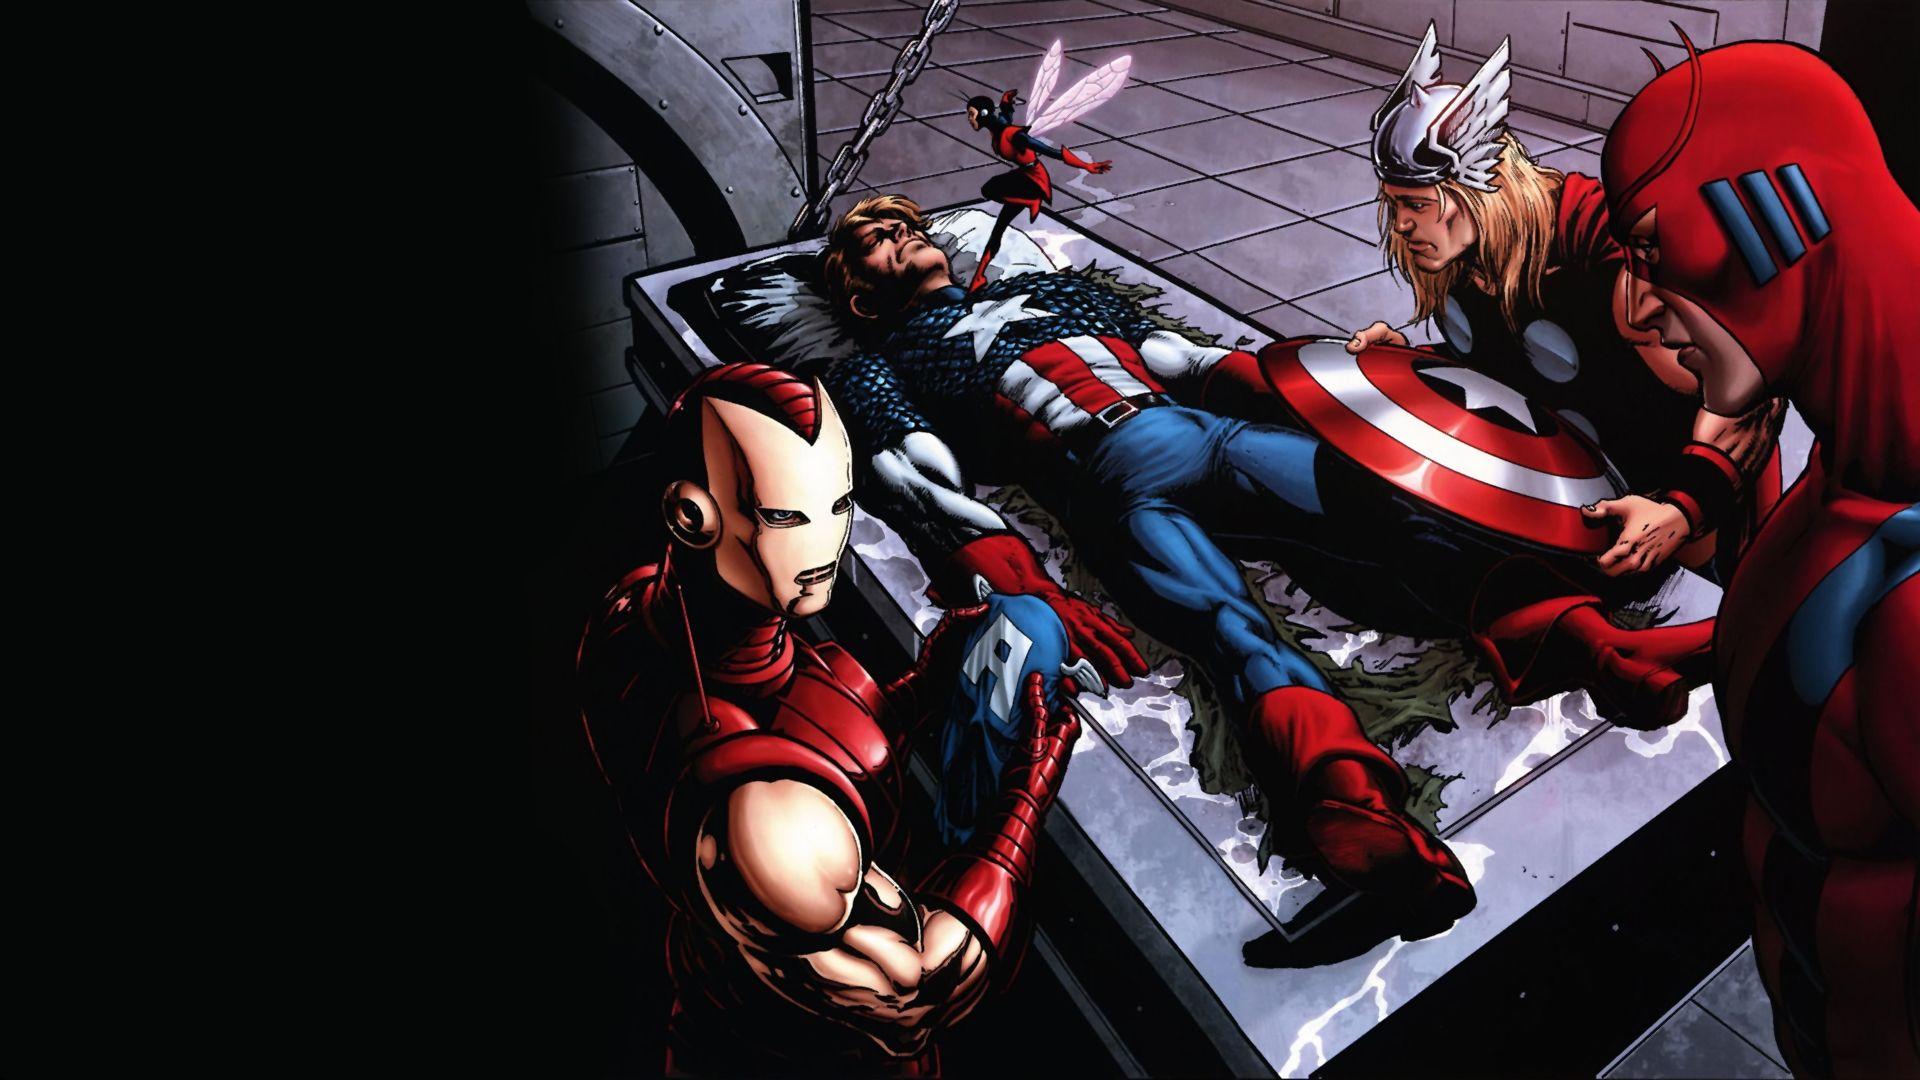 Iron Man Thor Captain America Marvel Comics The Avengers